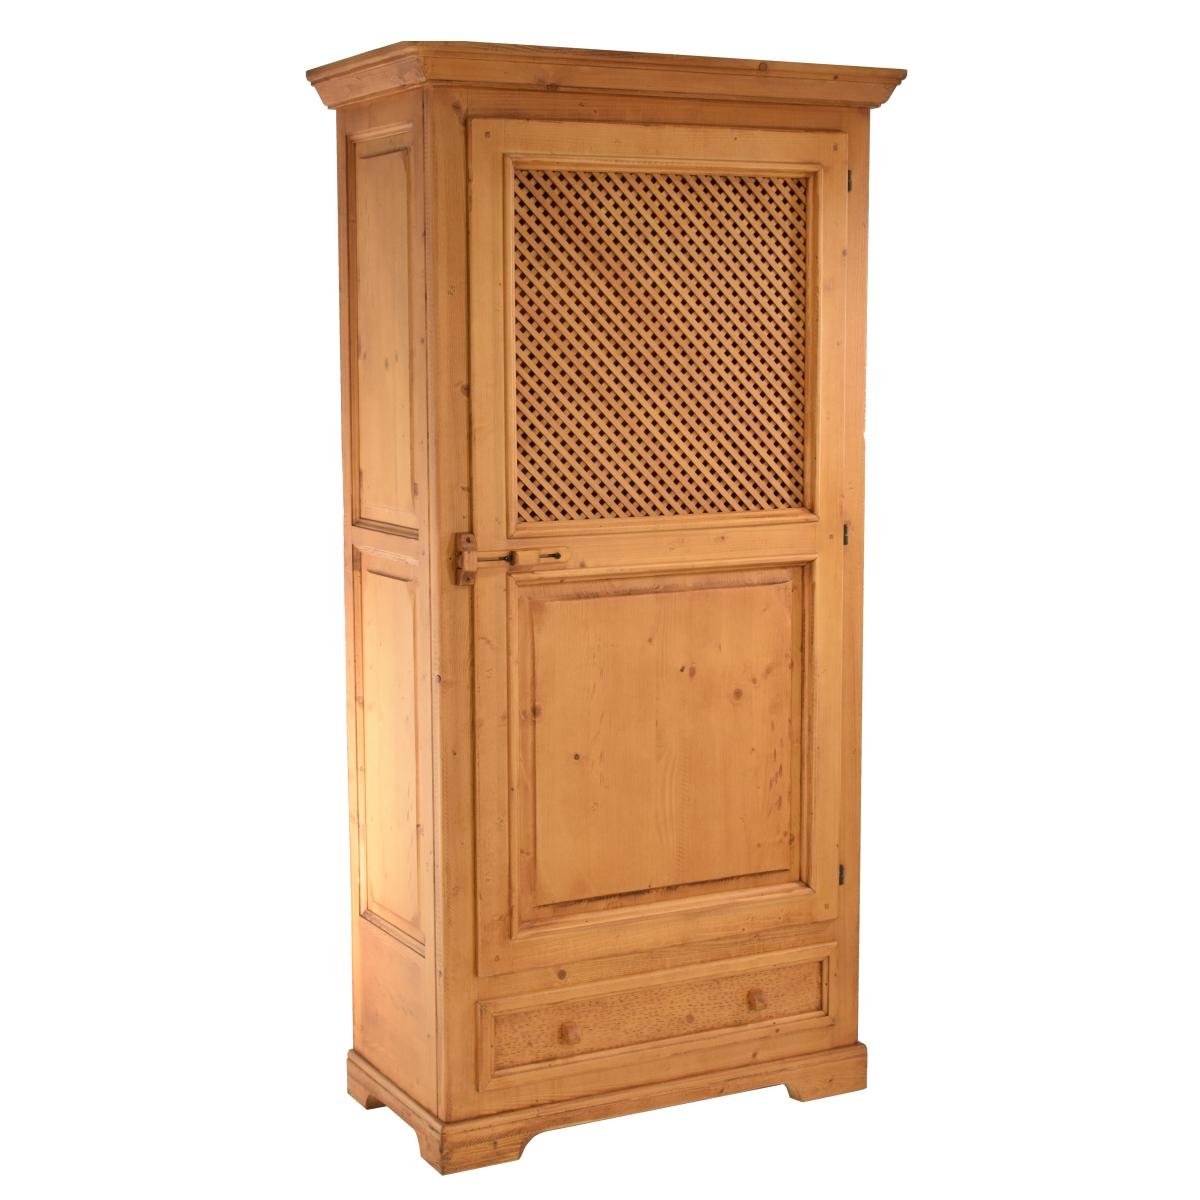 Armario recibidor r stico de madera ecor stico venta de for Armario de madera conforama